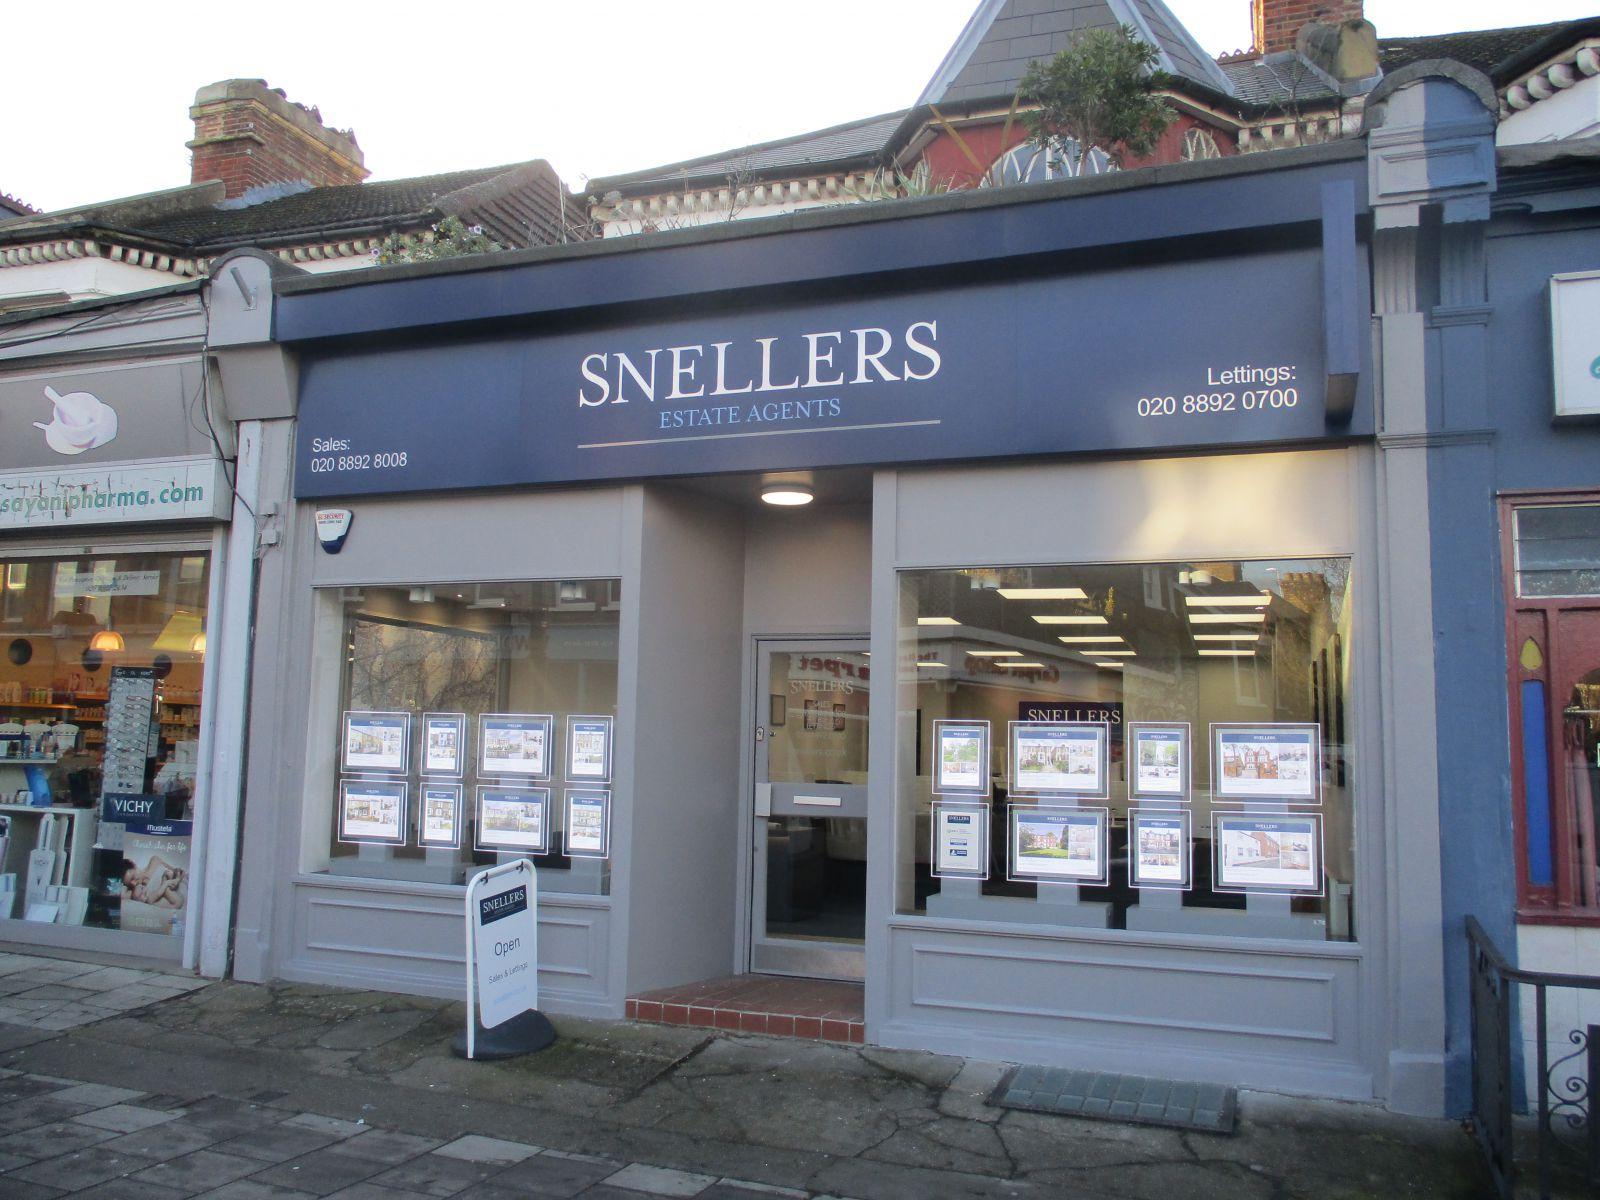 Snellers St Margarets Estate Agents - Twickenham, London TW1 3EH - 020 8892 8008 | ShowMeLocal.com